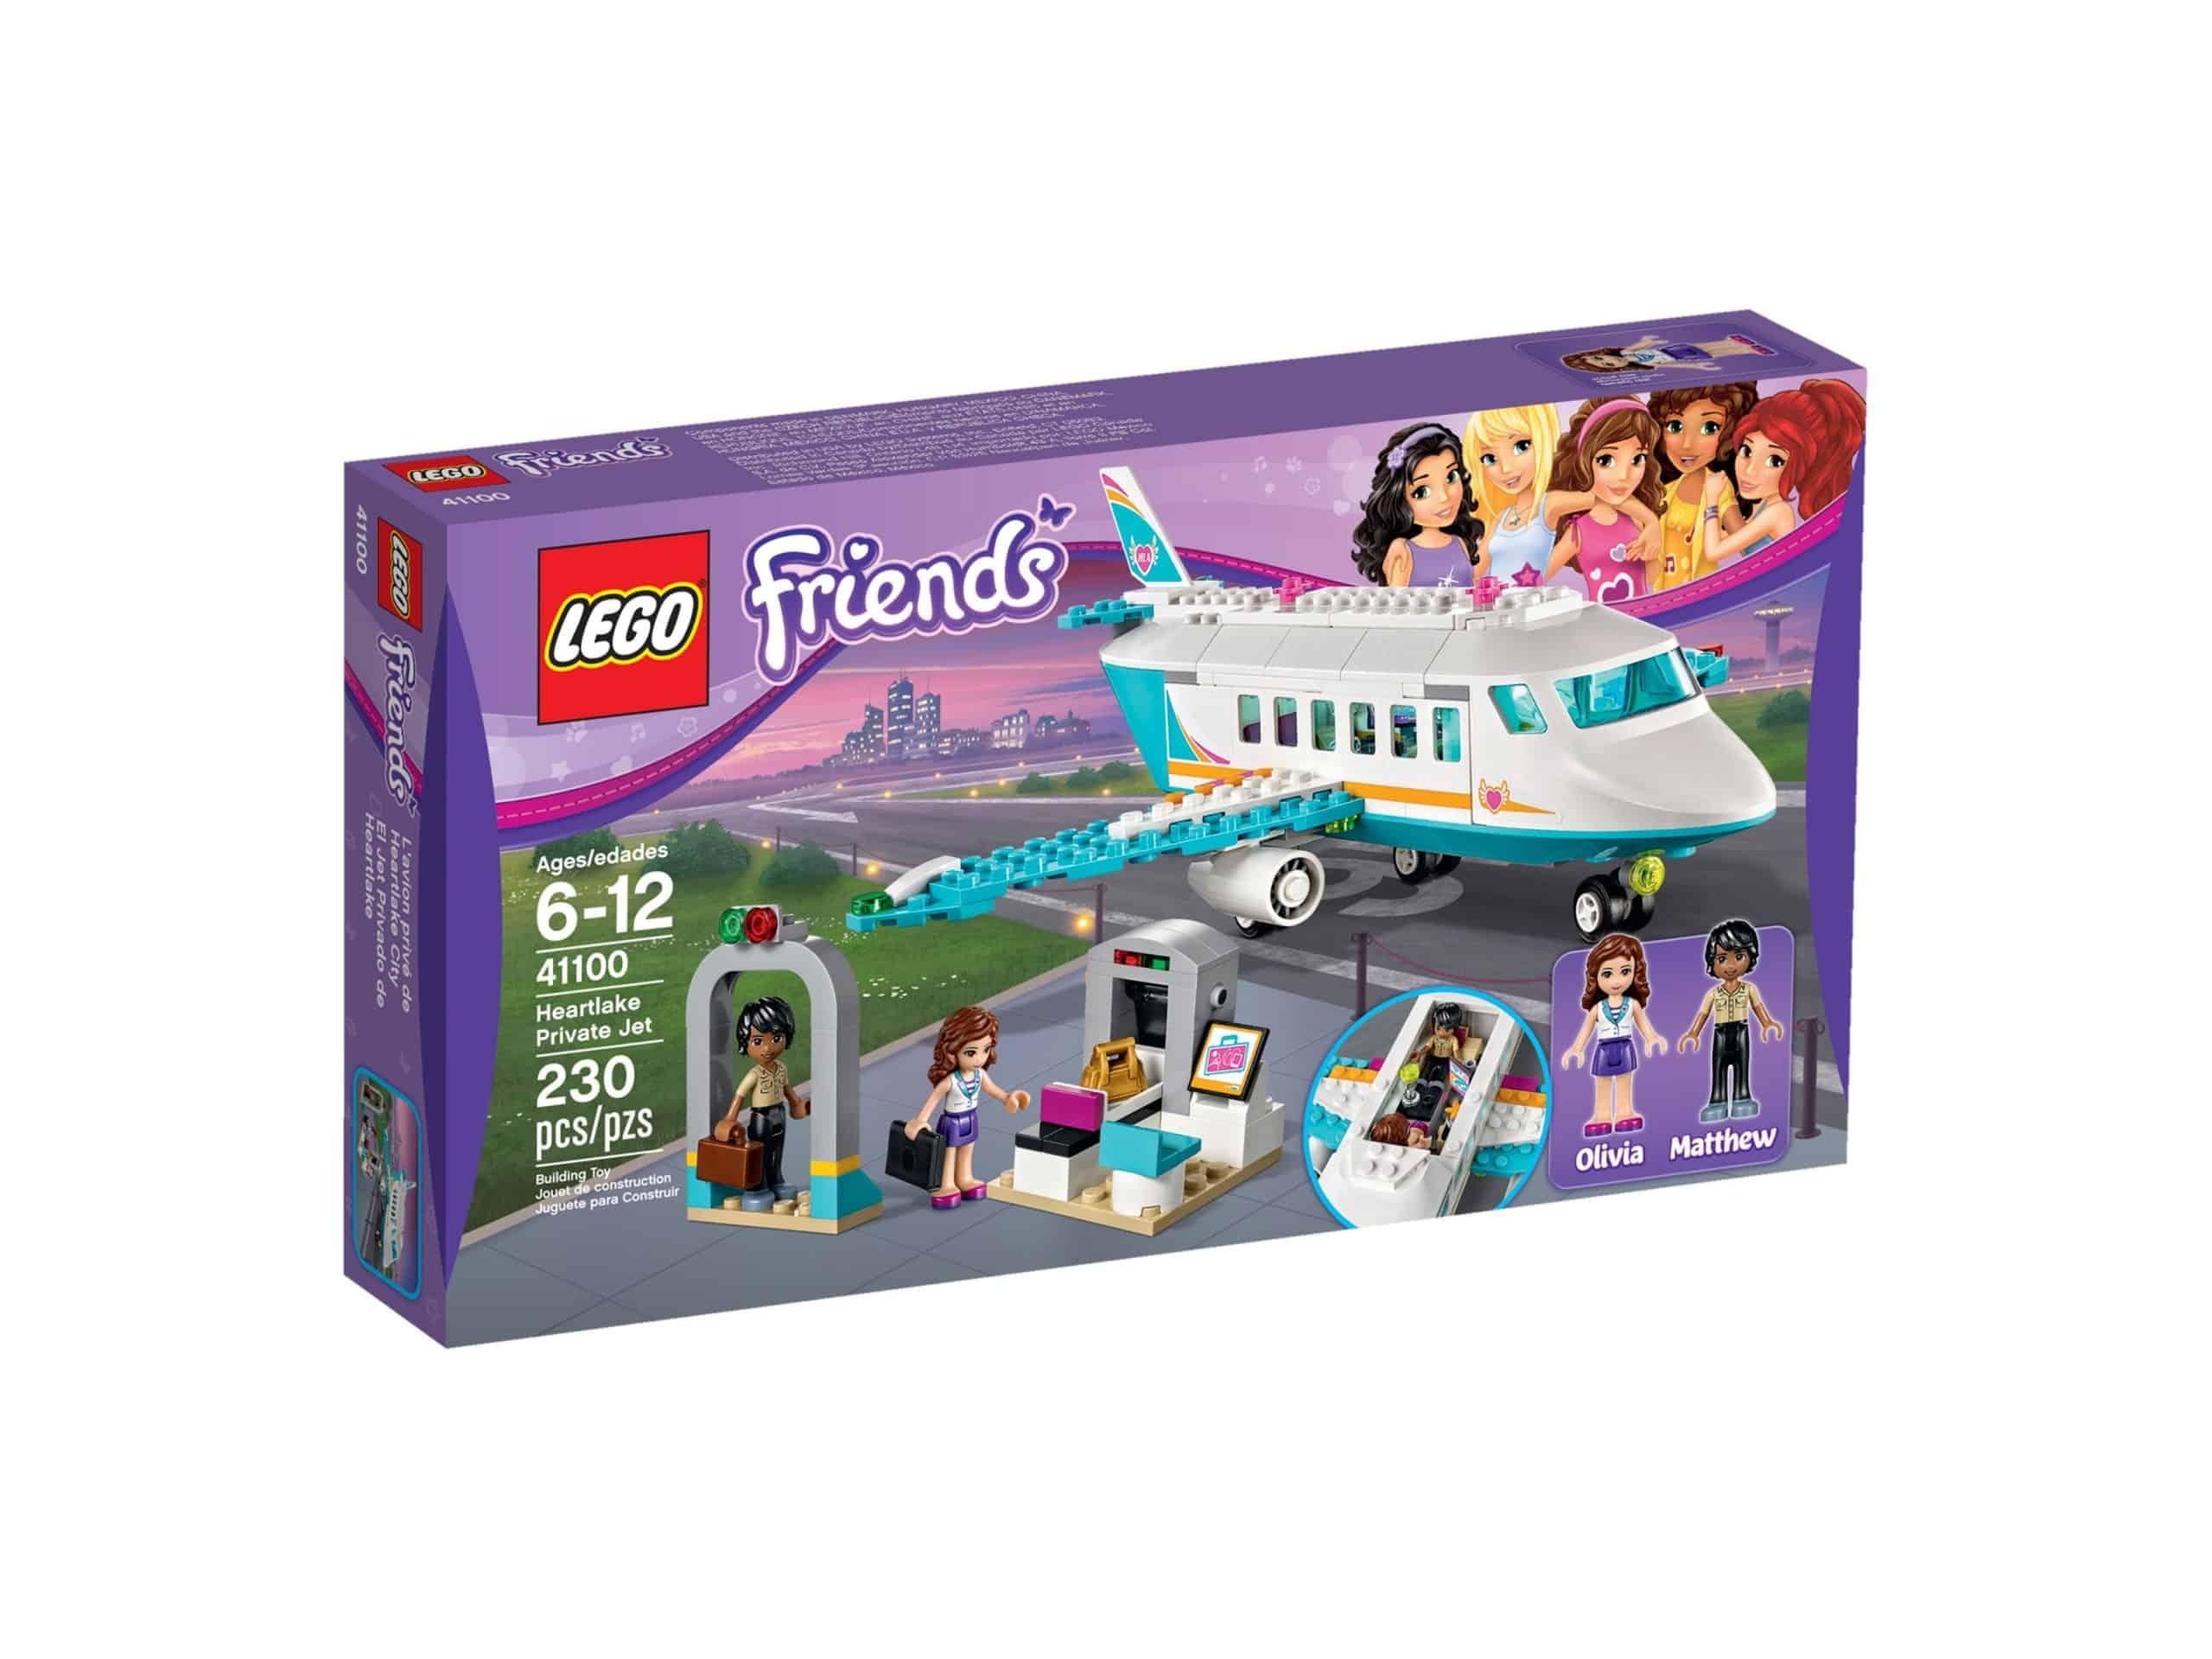 lego 41100 heartlake privat jetfly scaled